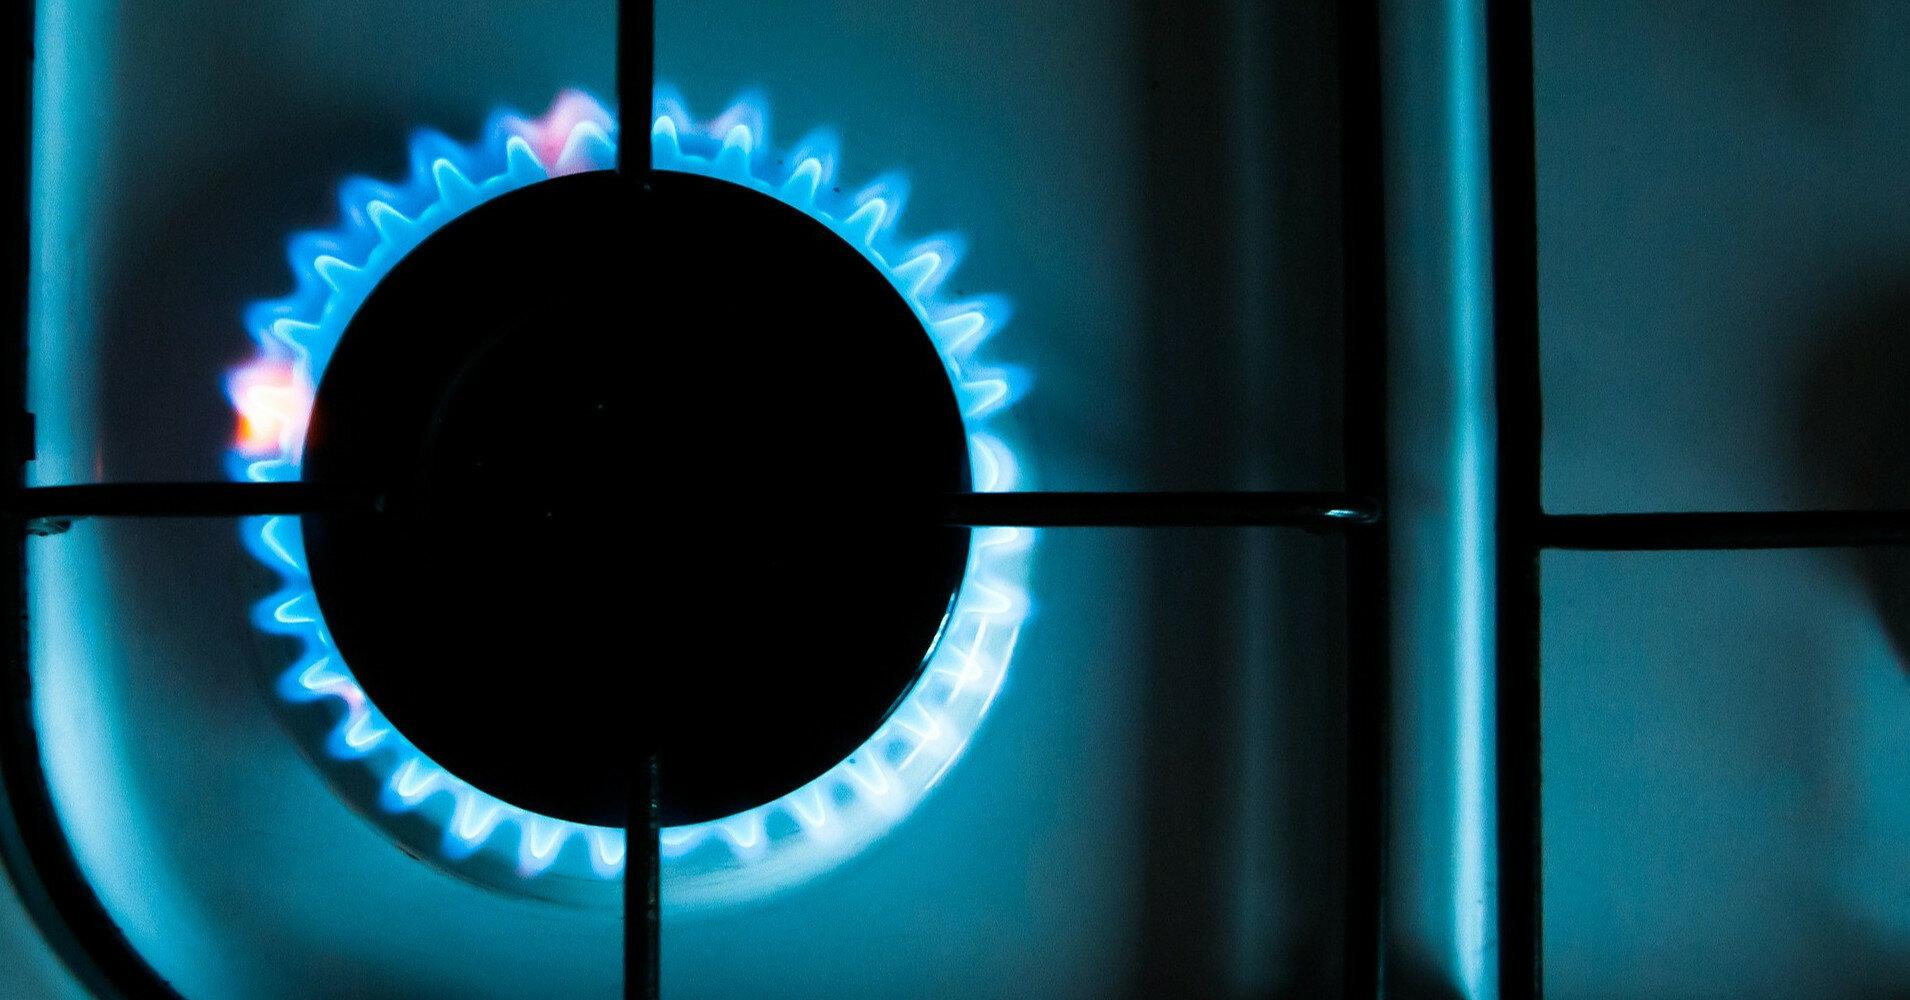 Газ снова подорожал: Нафтогаз объявил тариф на июль